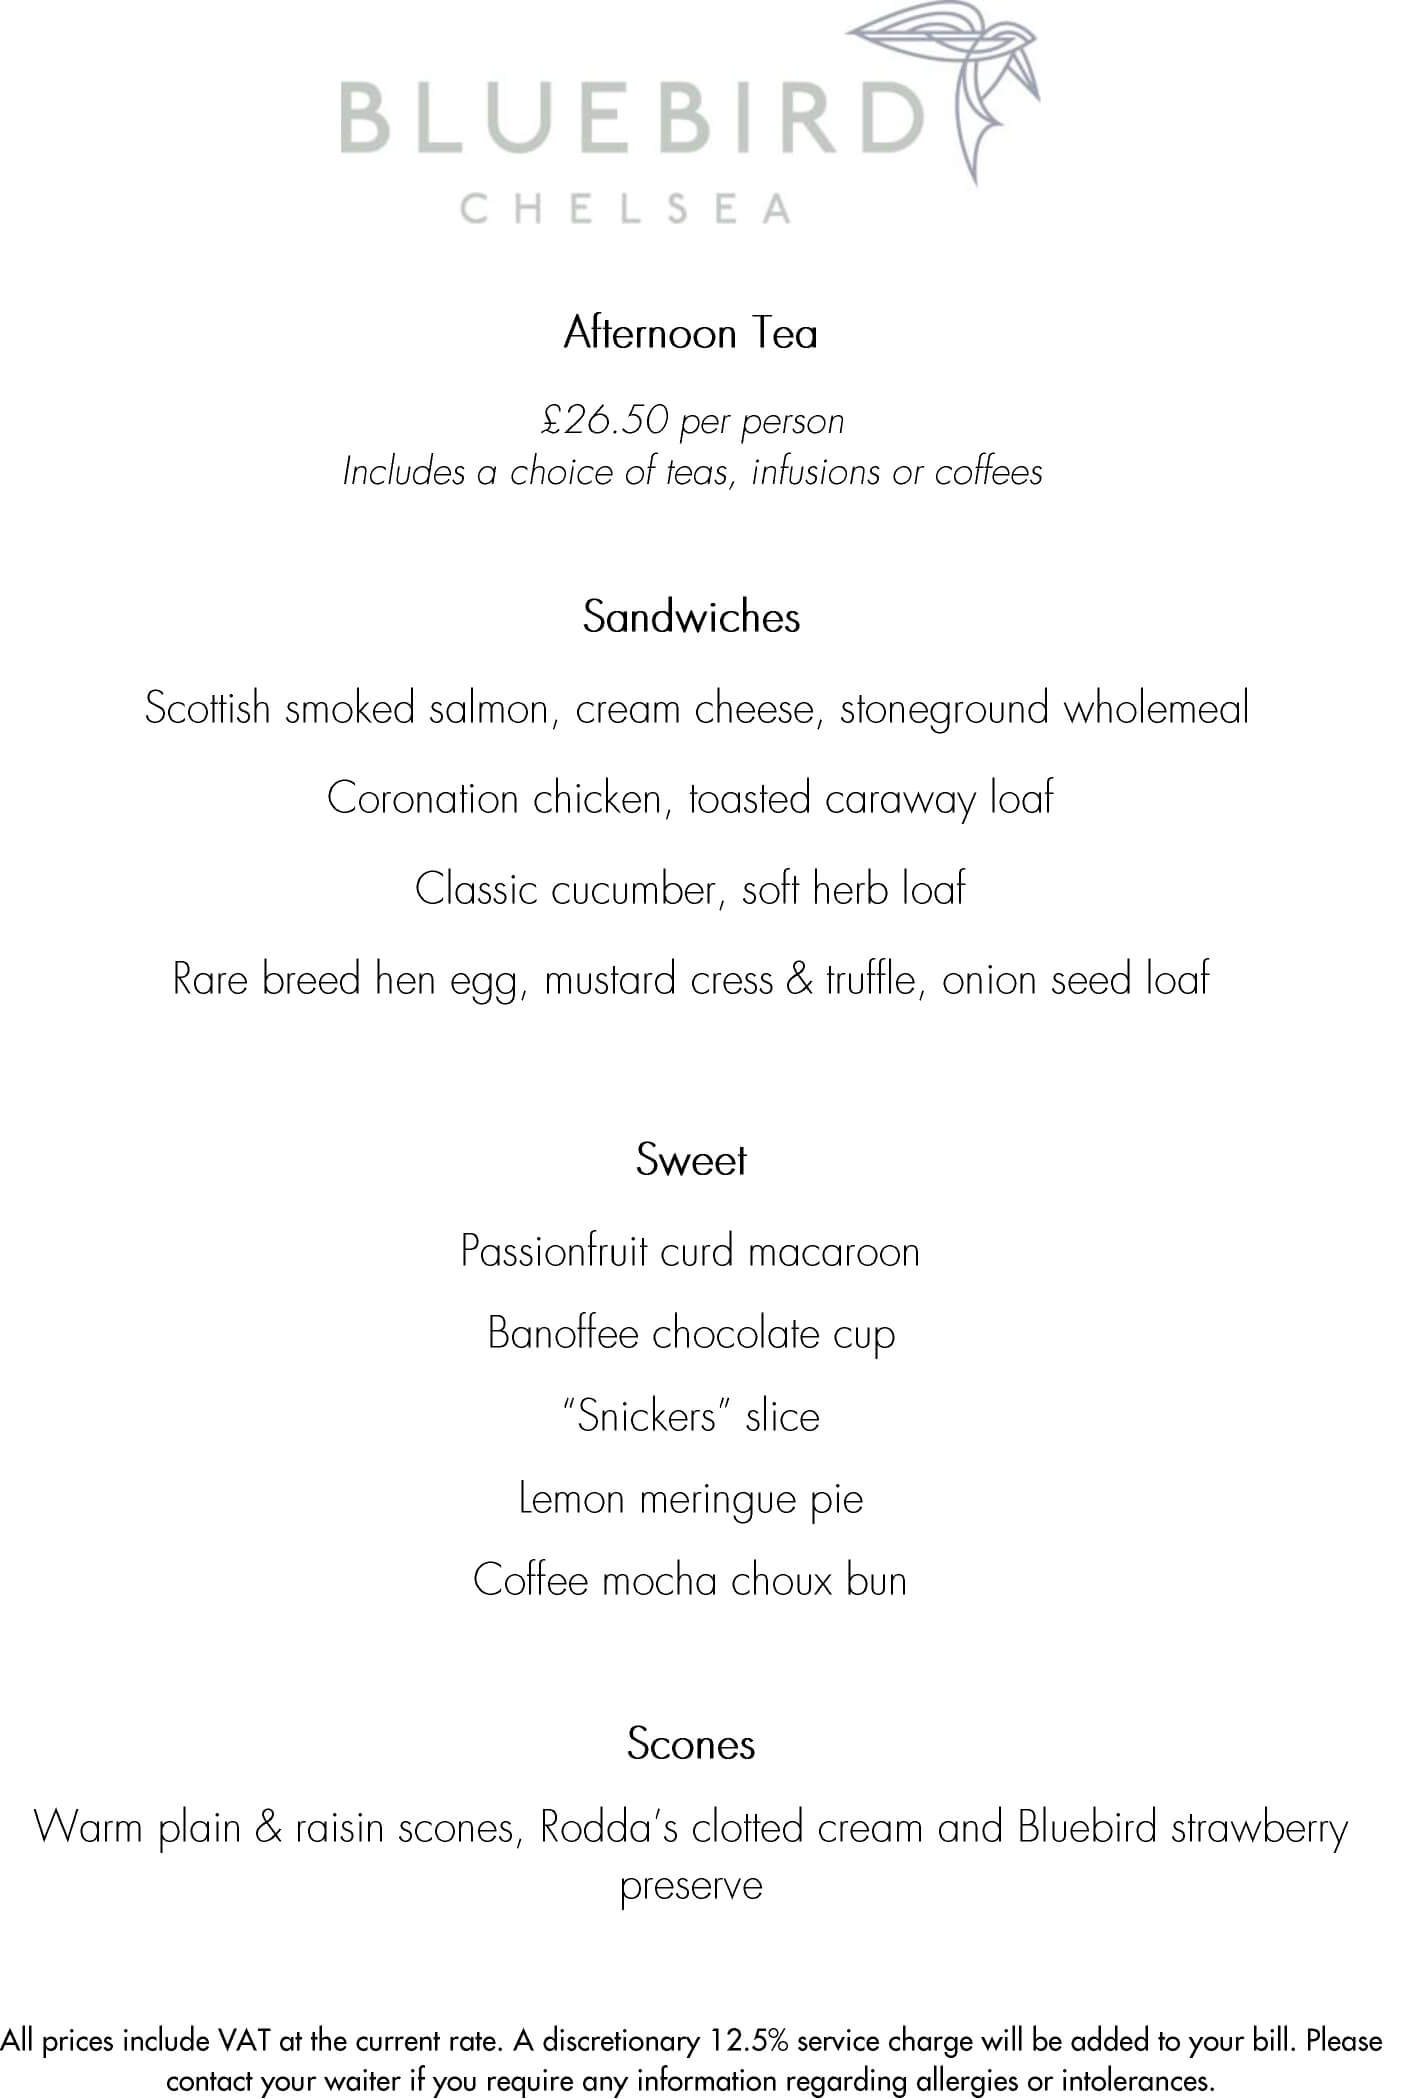 Bluebird Chelsea Afternoon tea menu